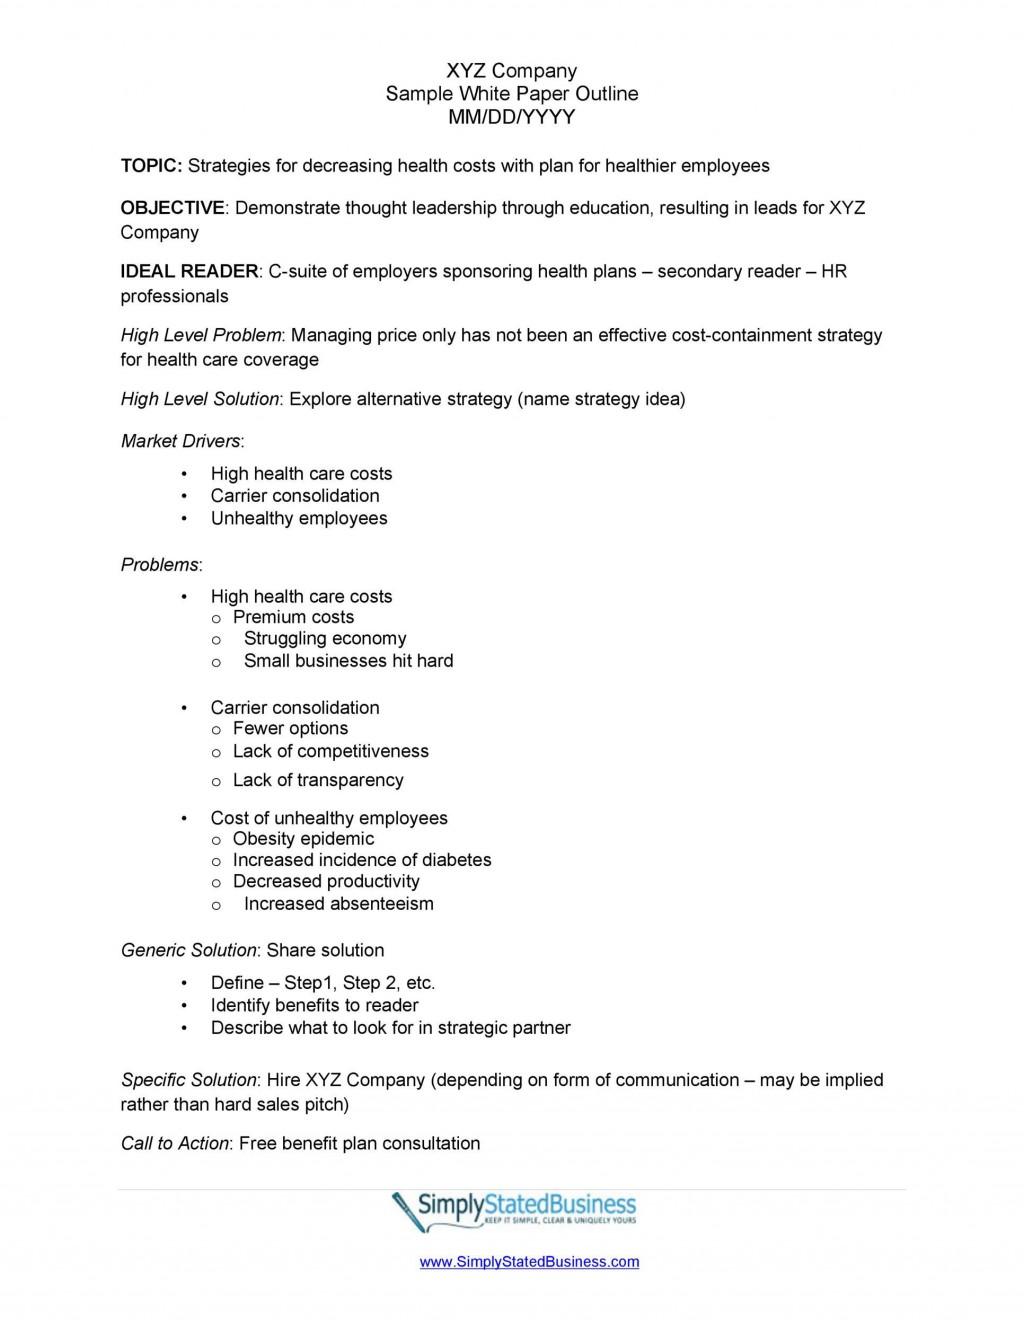 006 Remarkable White Paper Outline Sample Concept Large